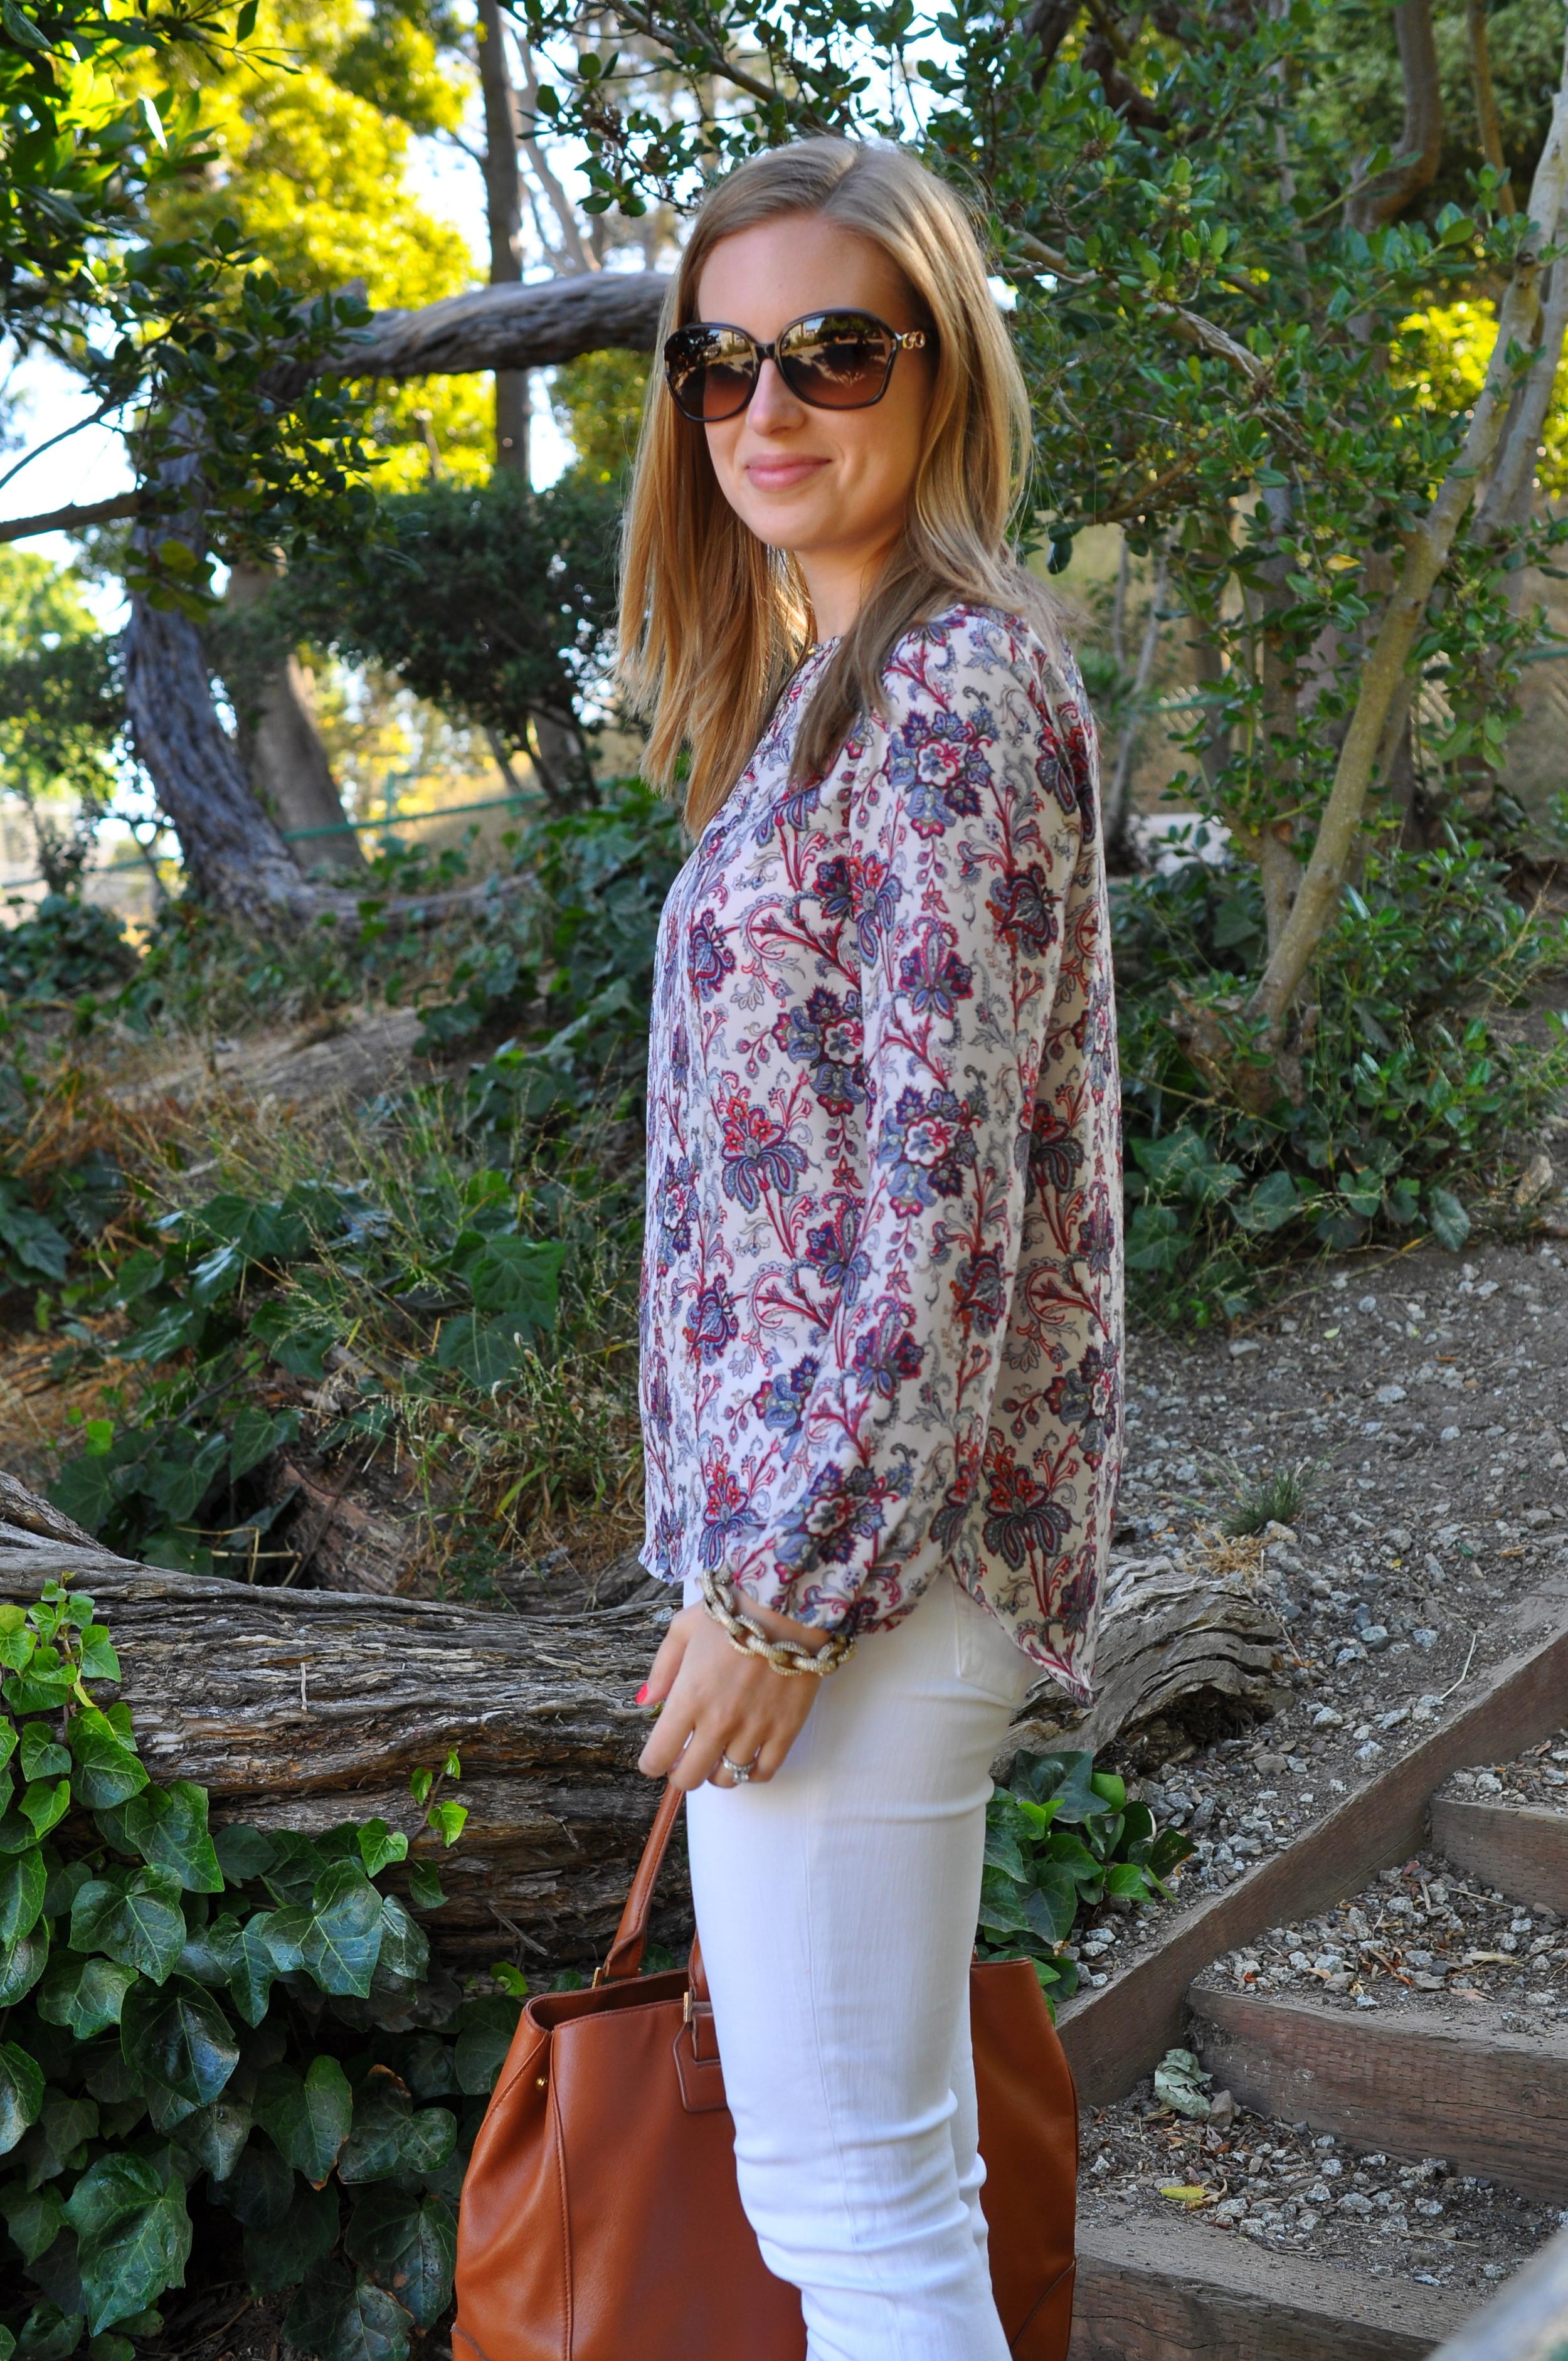 Zara blouse (old), AG jeans, Sam Edelman sandals, J. Crew bracelet, Tory Burch bag, Coach sunglasses